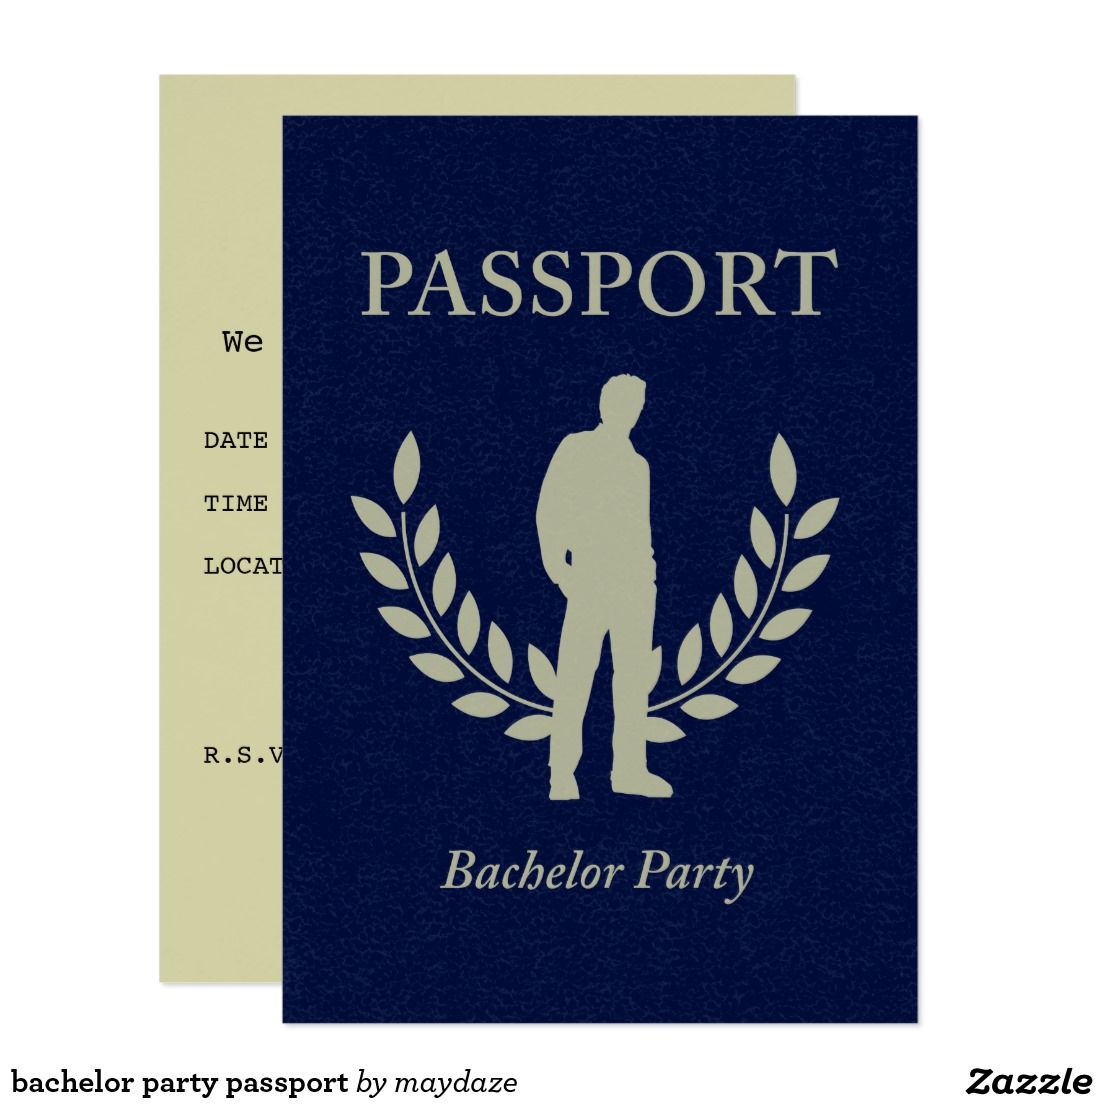 bachelor party passport invitation Passport